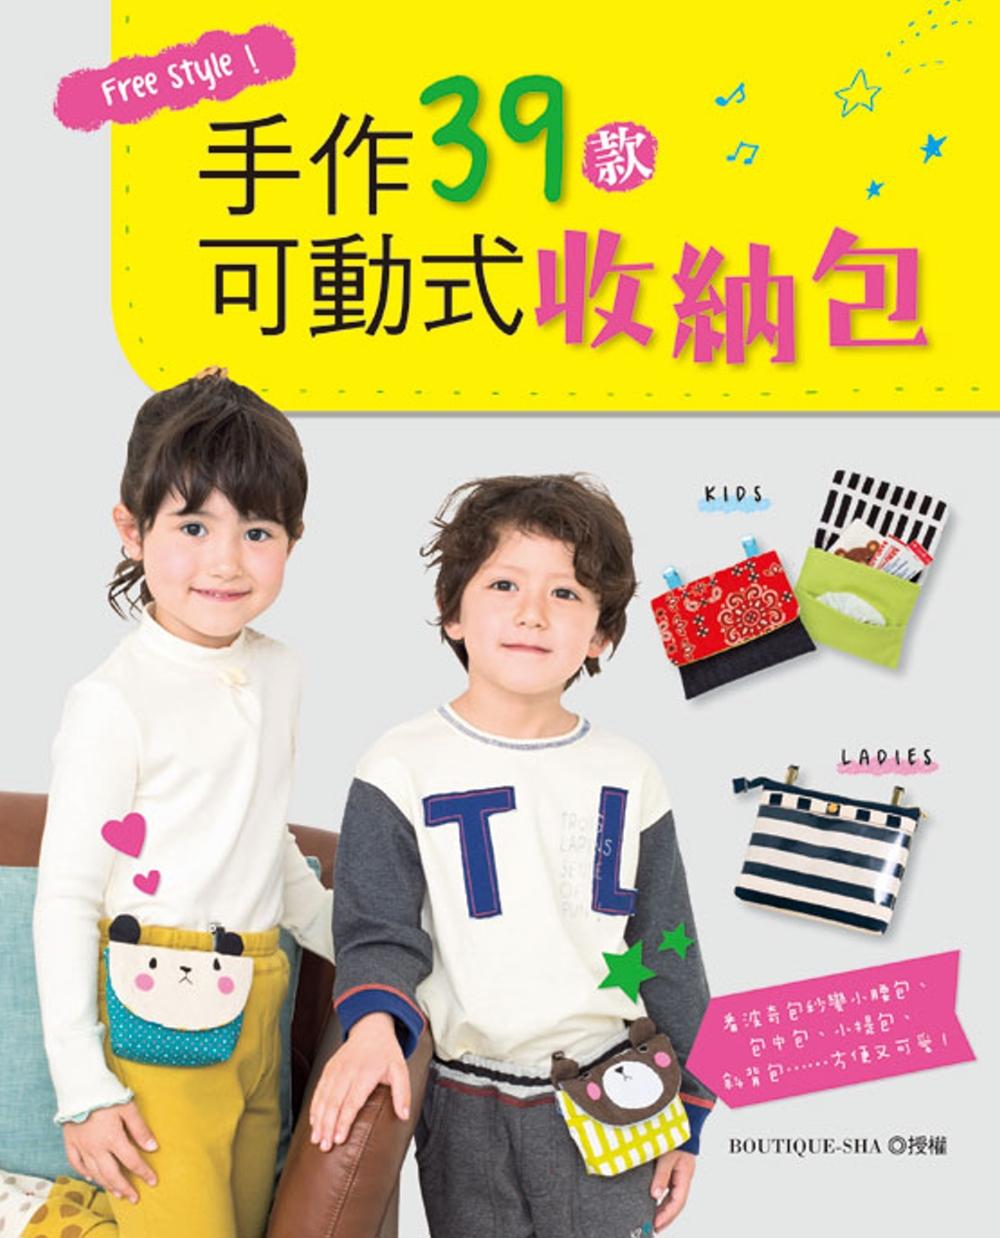 Free Style!手作39款可動式收納包:看波奇包秒變小腰包、包中包、小提包、斜背包……方便又可愛!